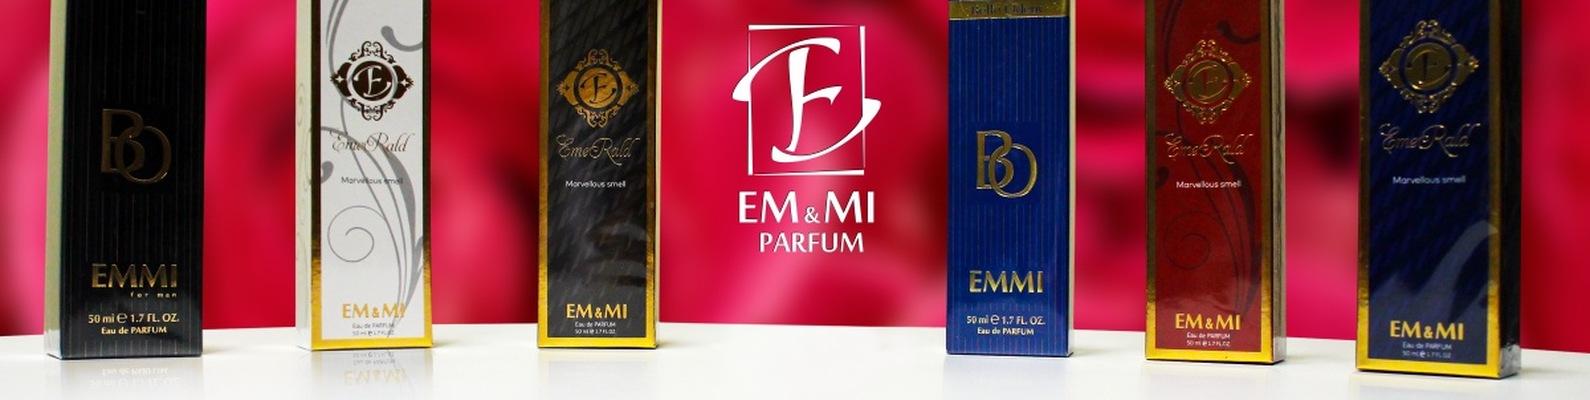 Emmi Parfum парфюм кириши доставка вконтакте